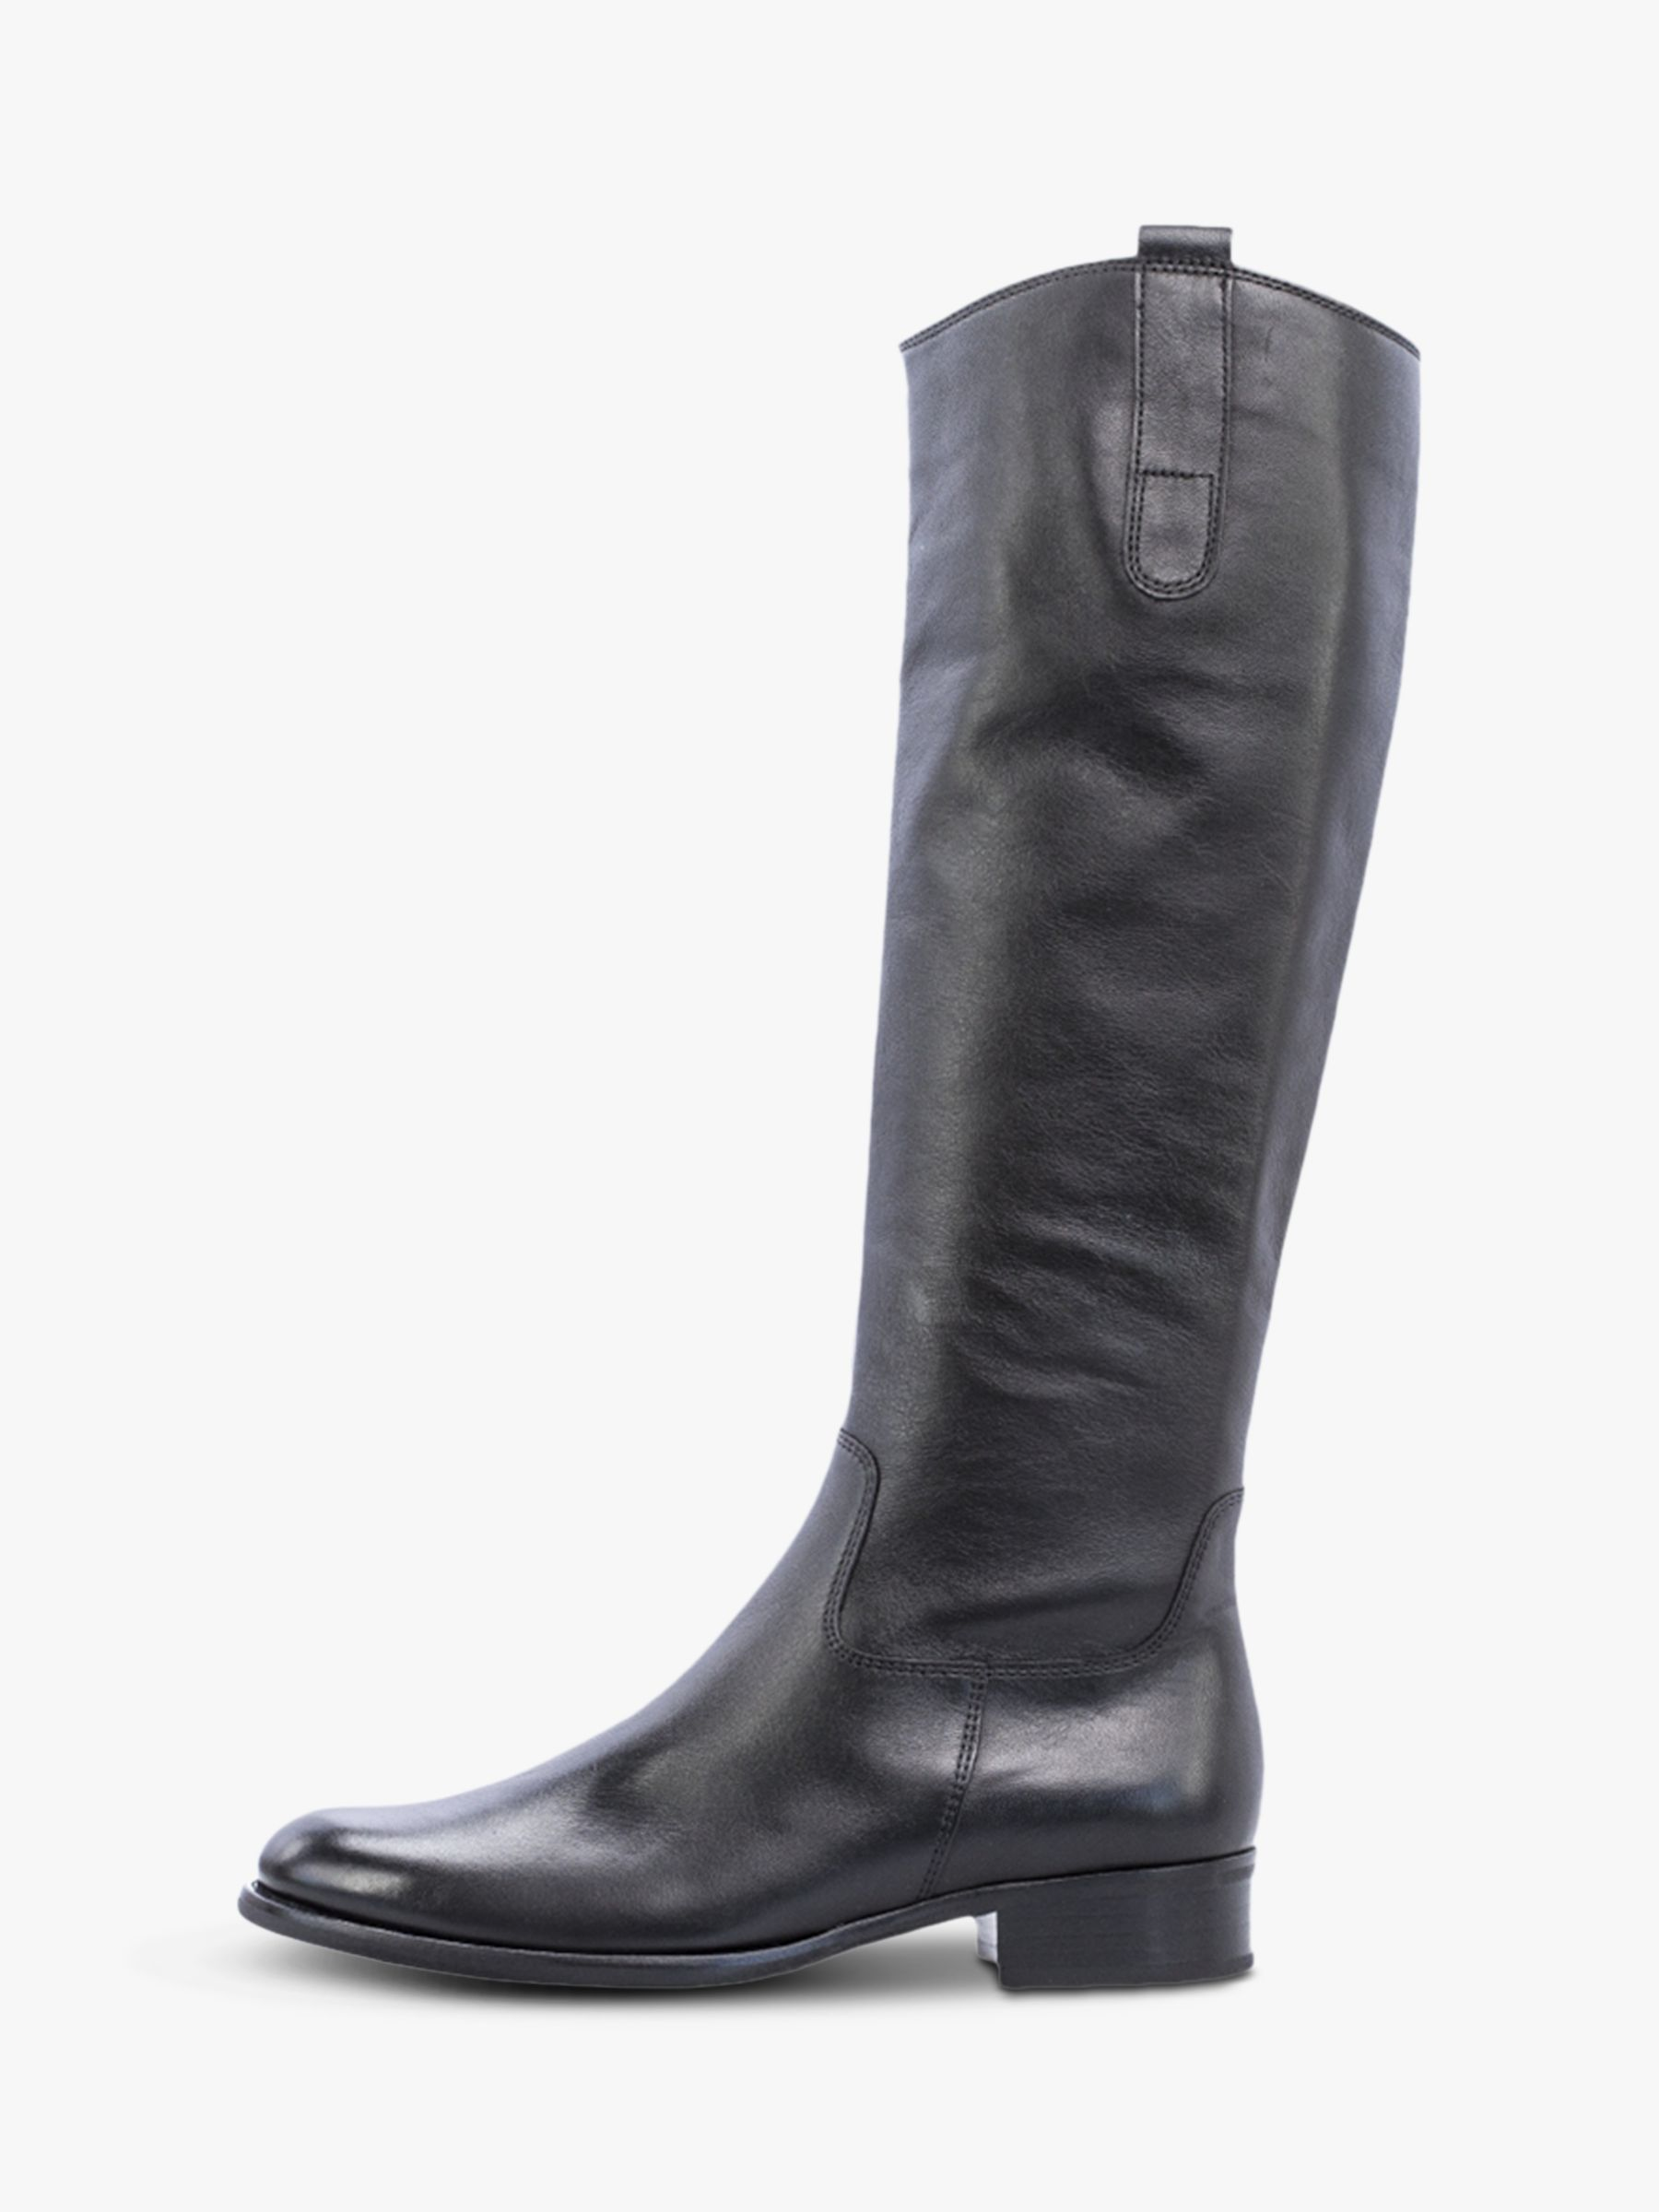 6257f7ffb11 Gabor Brook Slim Fit Low Block Heel Knee Boots at John Lewis   Partners